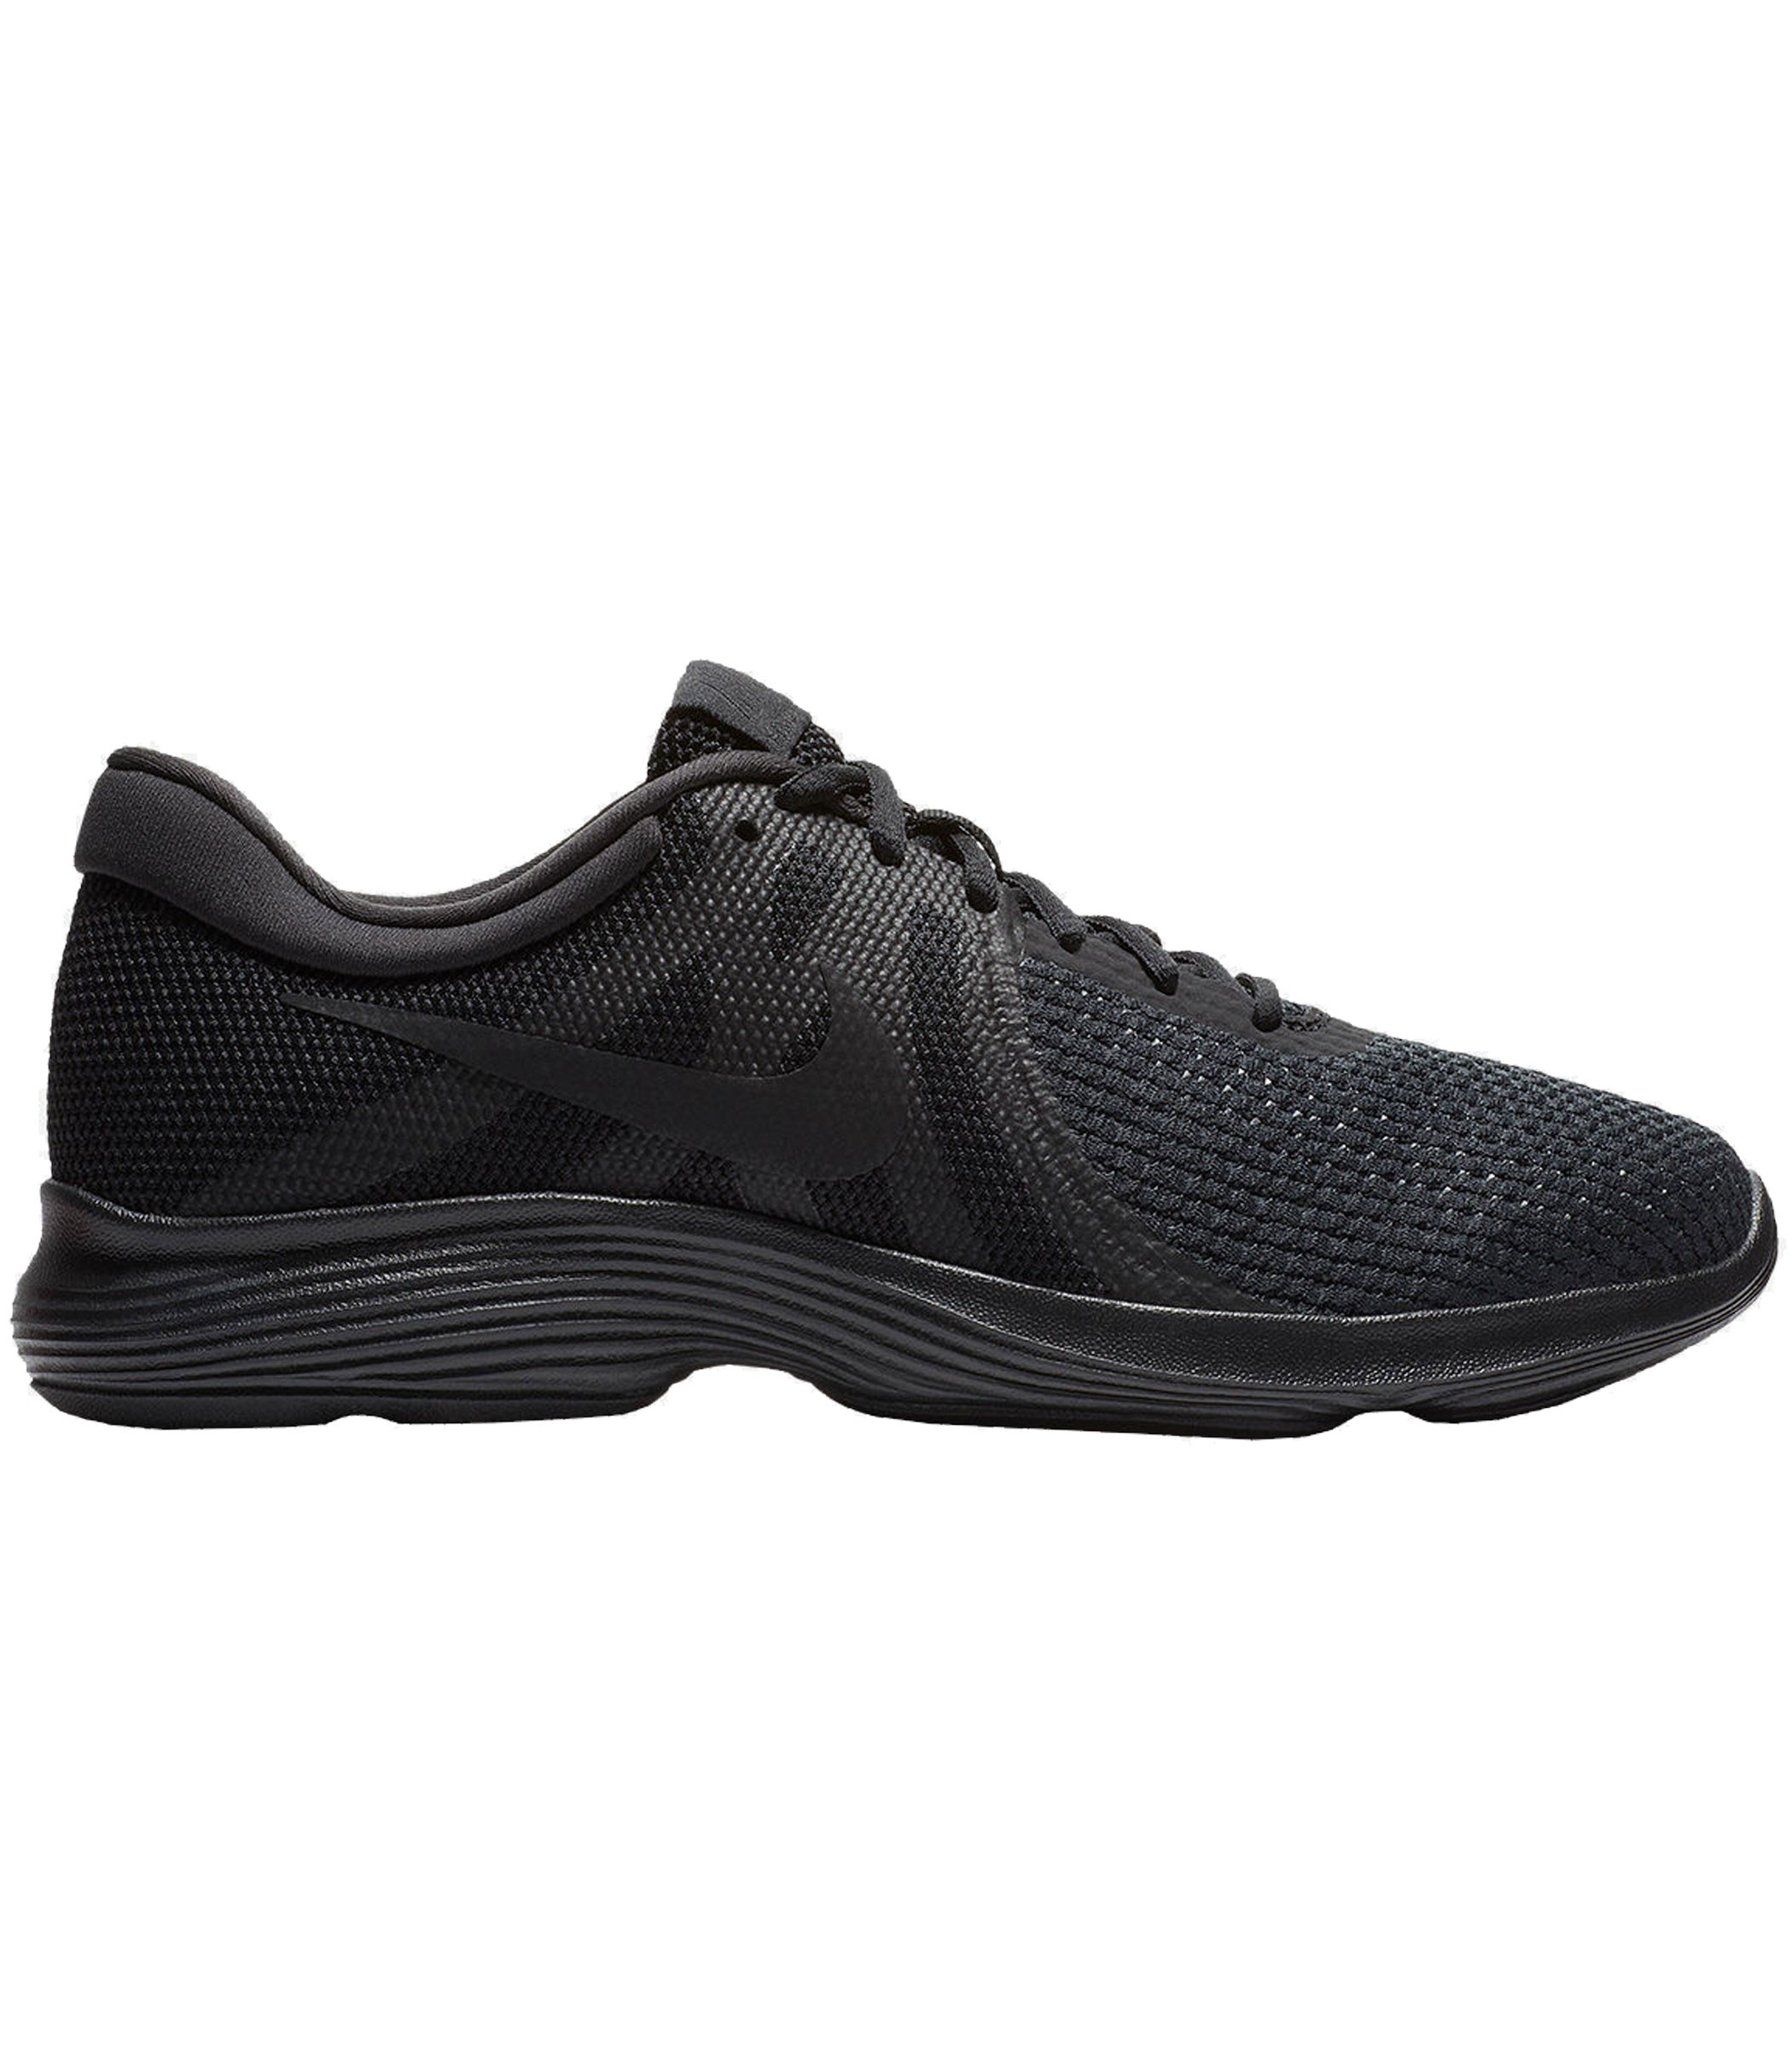 new concept 2b883 28f31 Scarpe Sneakers Running Nike Revolution 4 M da Uomo Rif. AJ3490-002